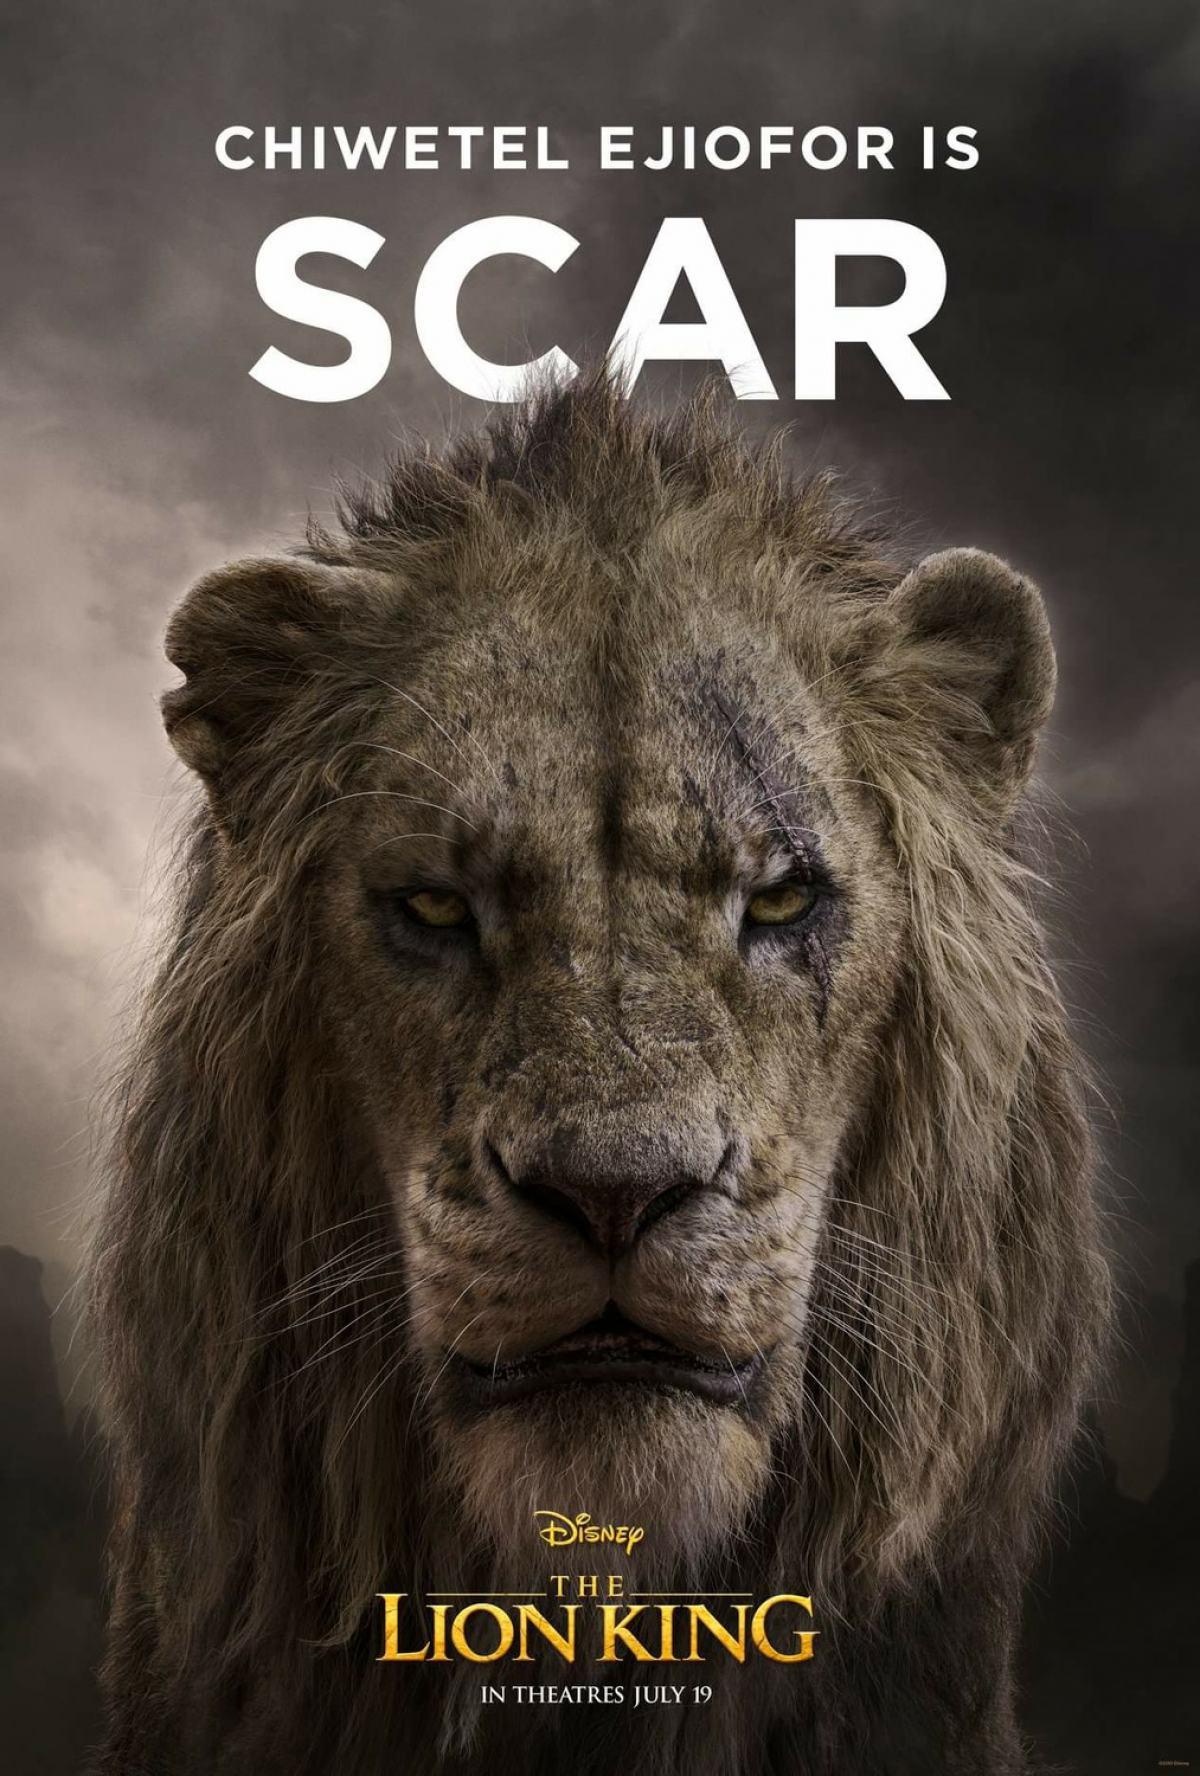 The Lion King 2019 Traileraddict